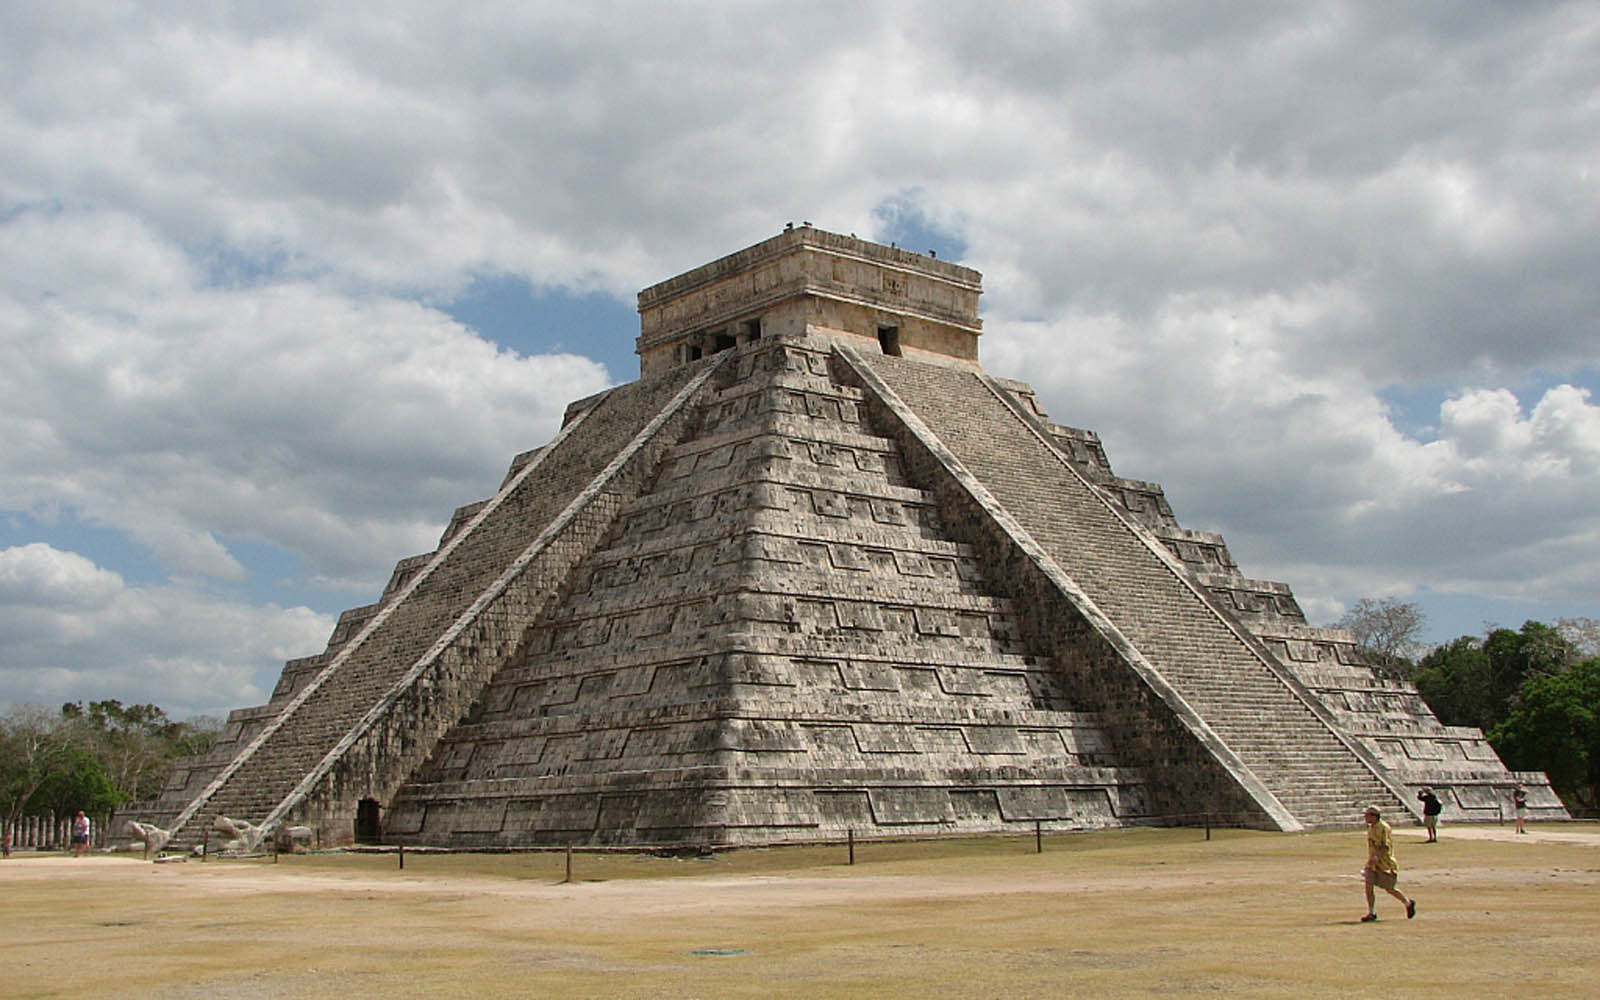 3d Wallpapers For Windows 8 Hd Free Download Wallpapers Chichen Itza Yucatan Mexico El Castillo